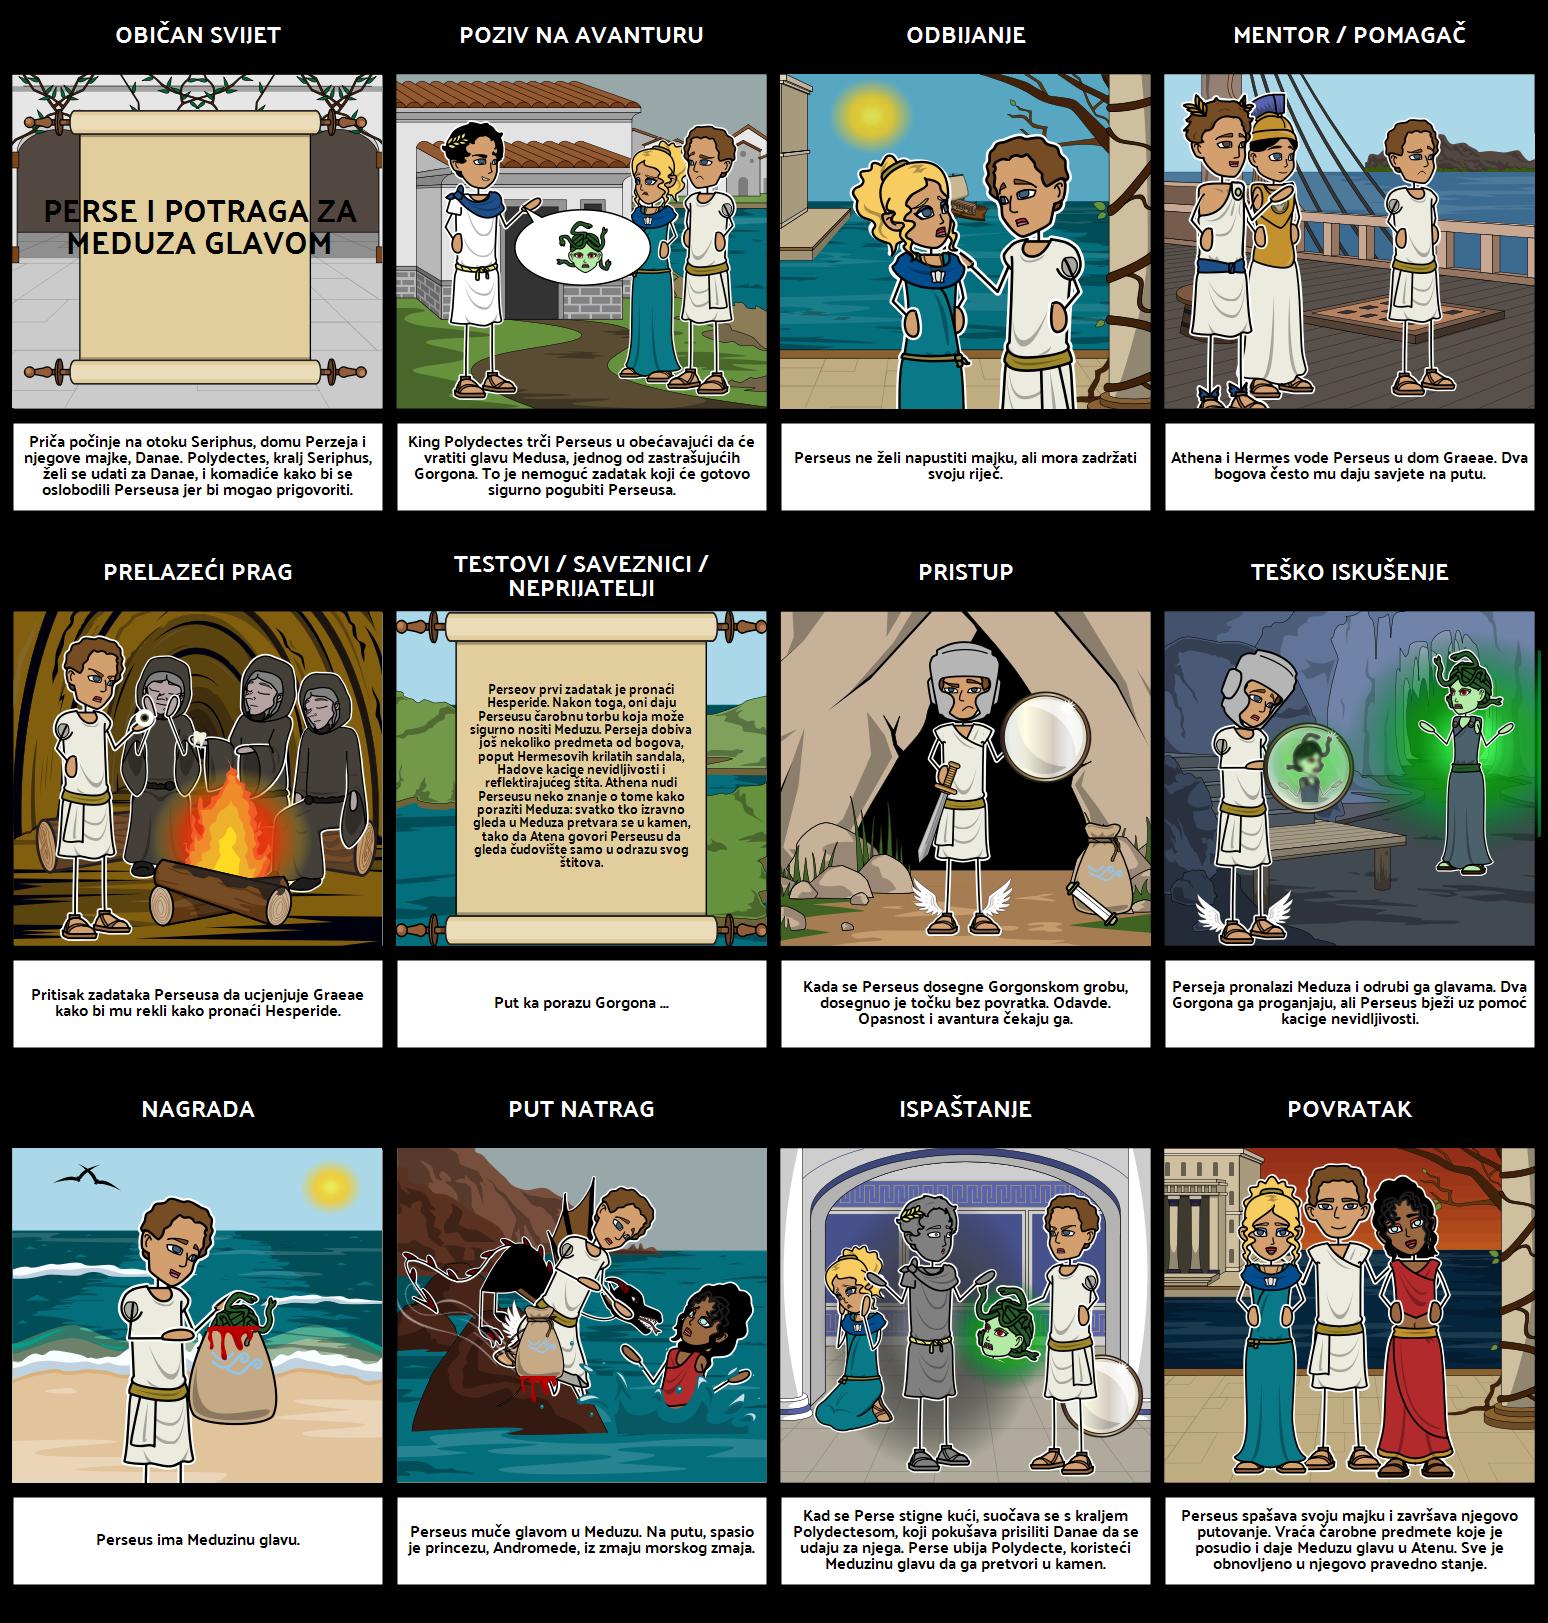 Grčka Mitologija - Herojsko Putovanje Perseusa